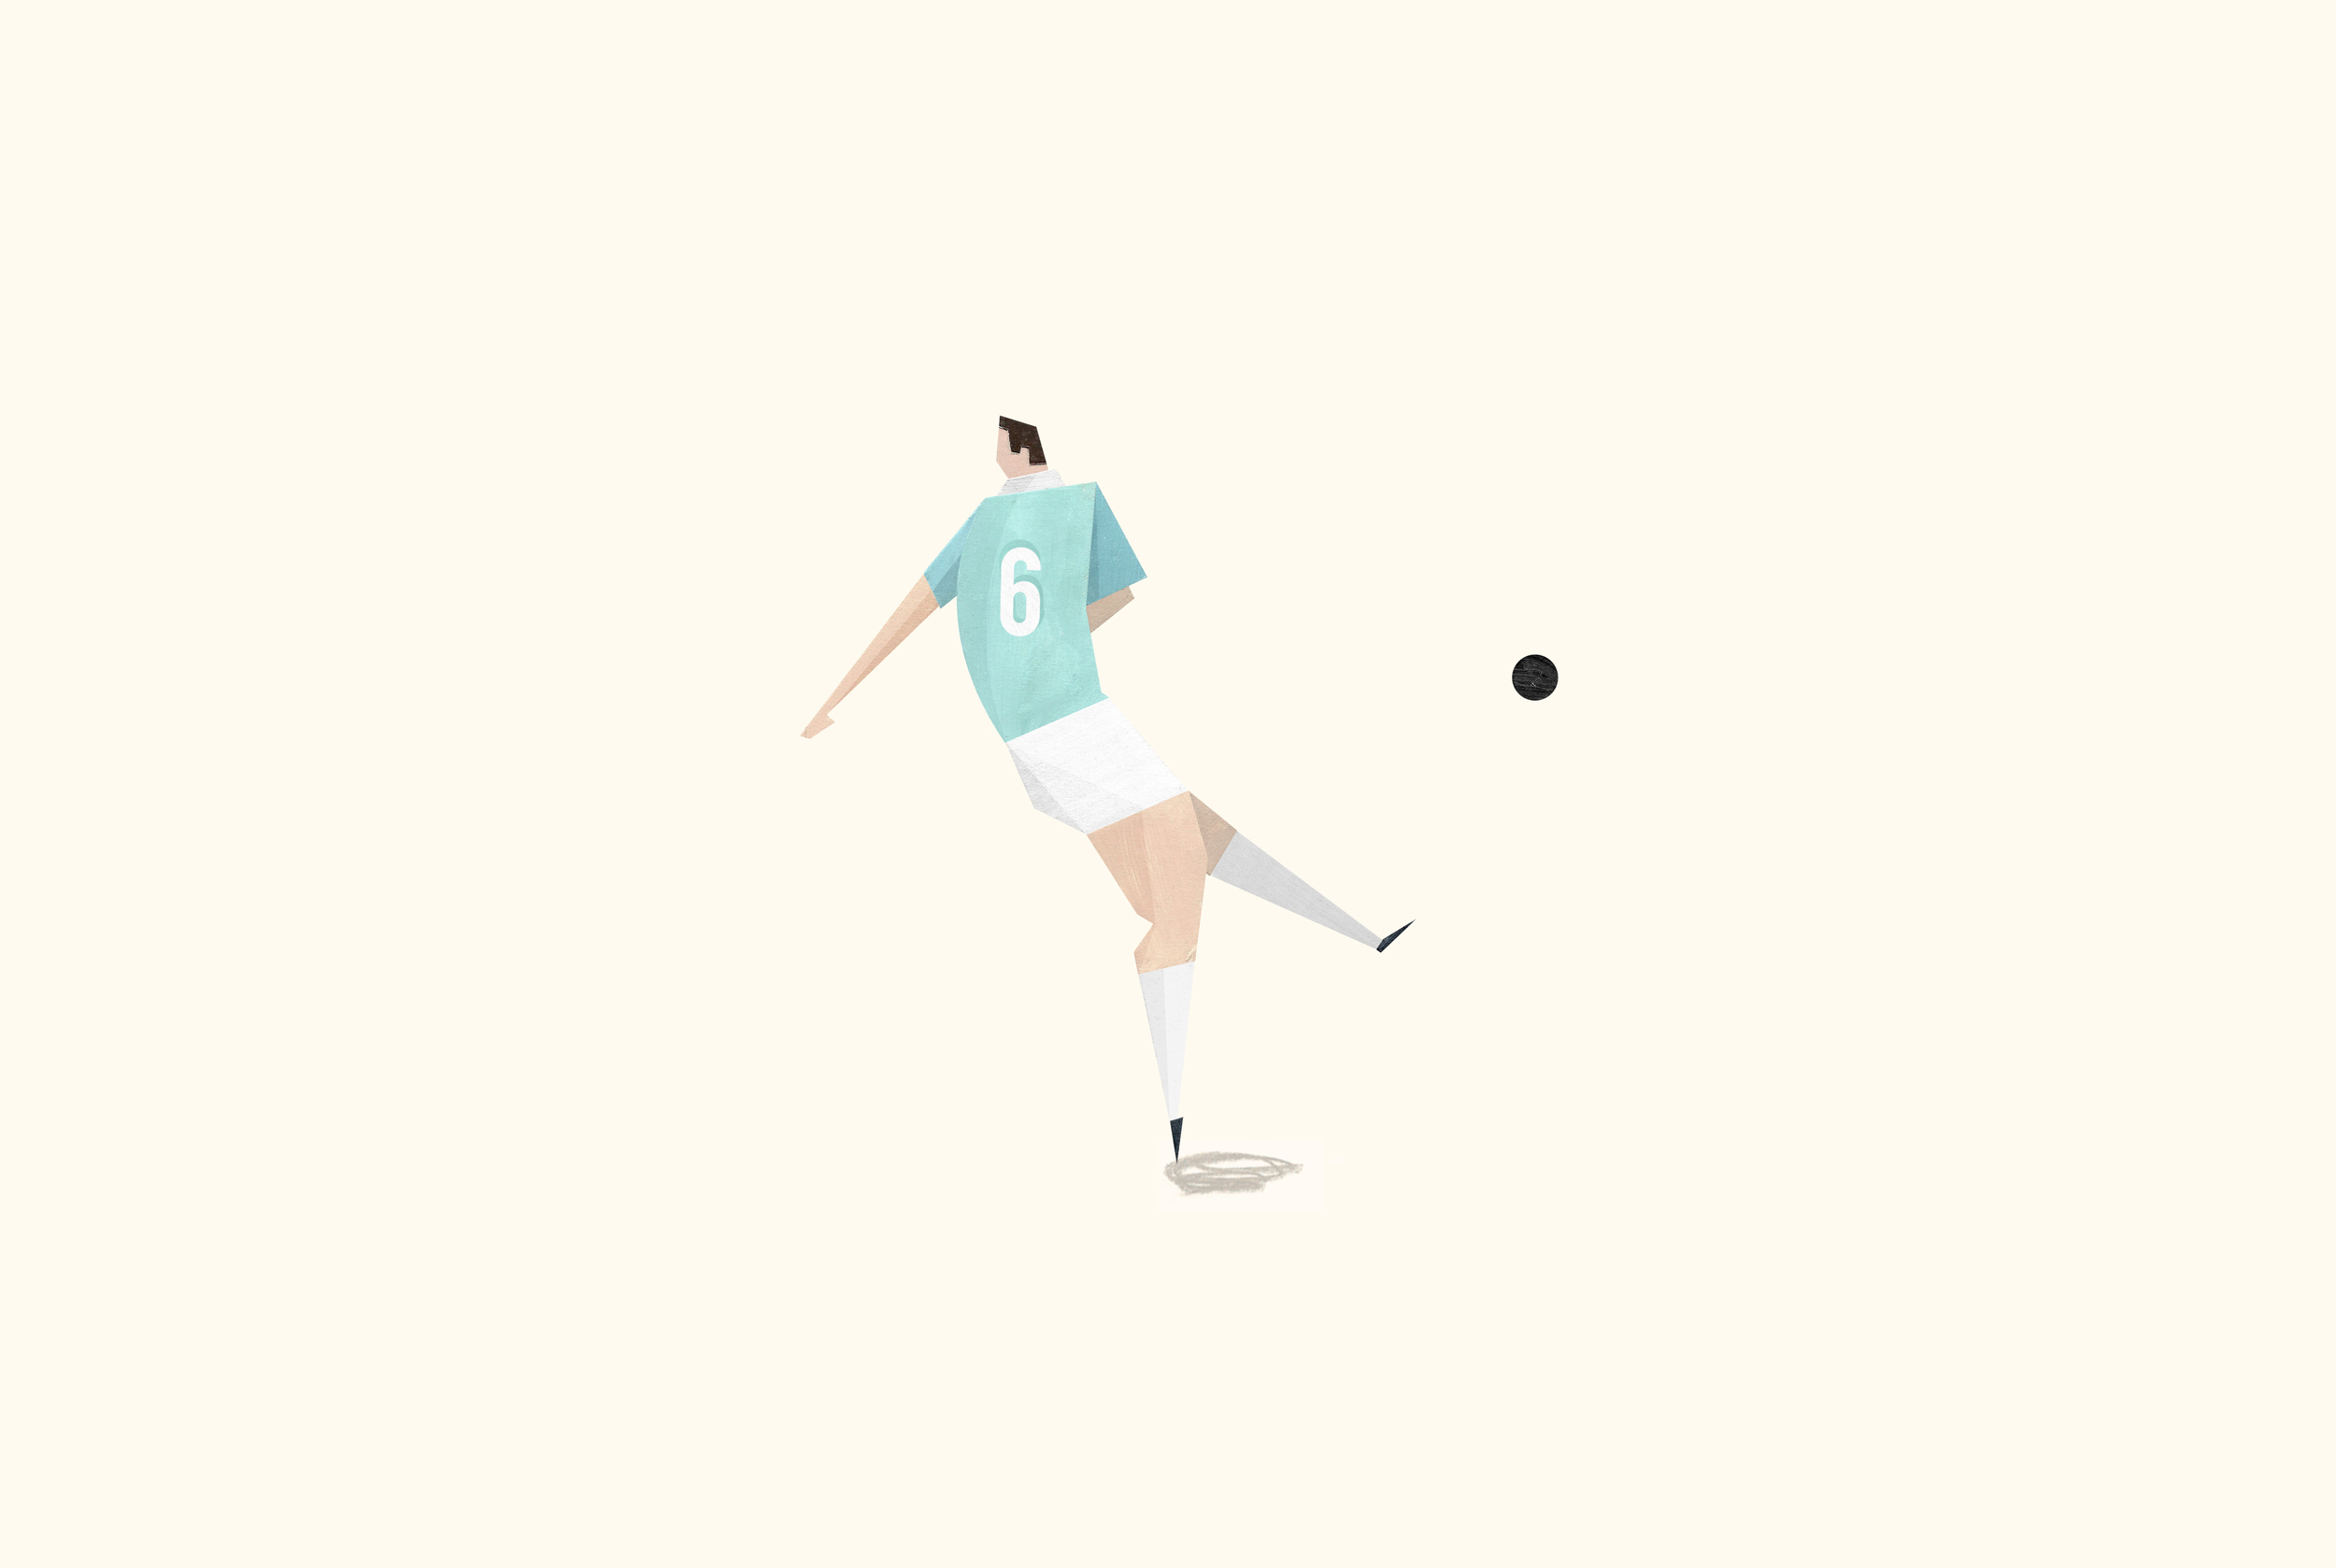 Sports_Figures_4.jpg